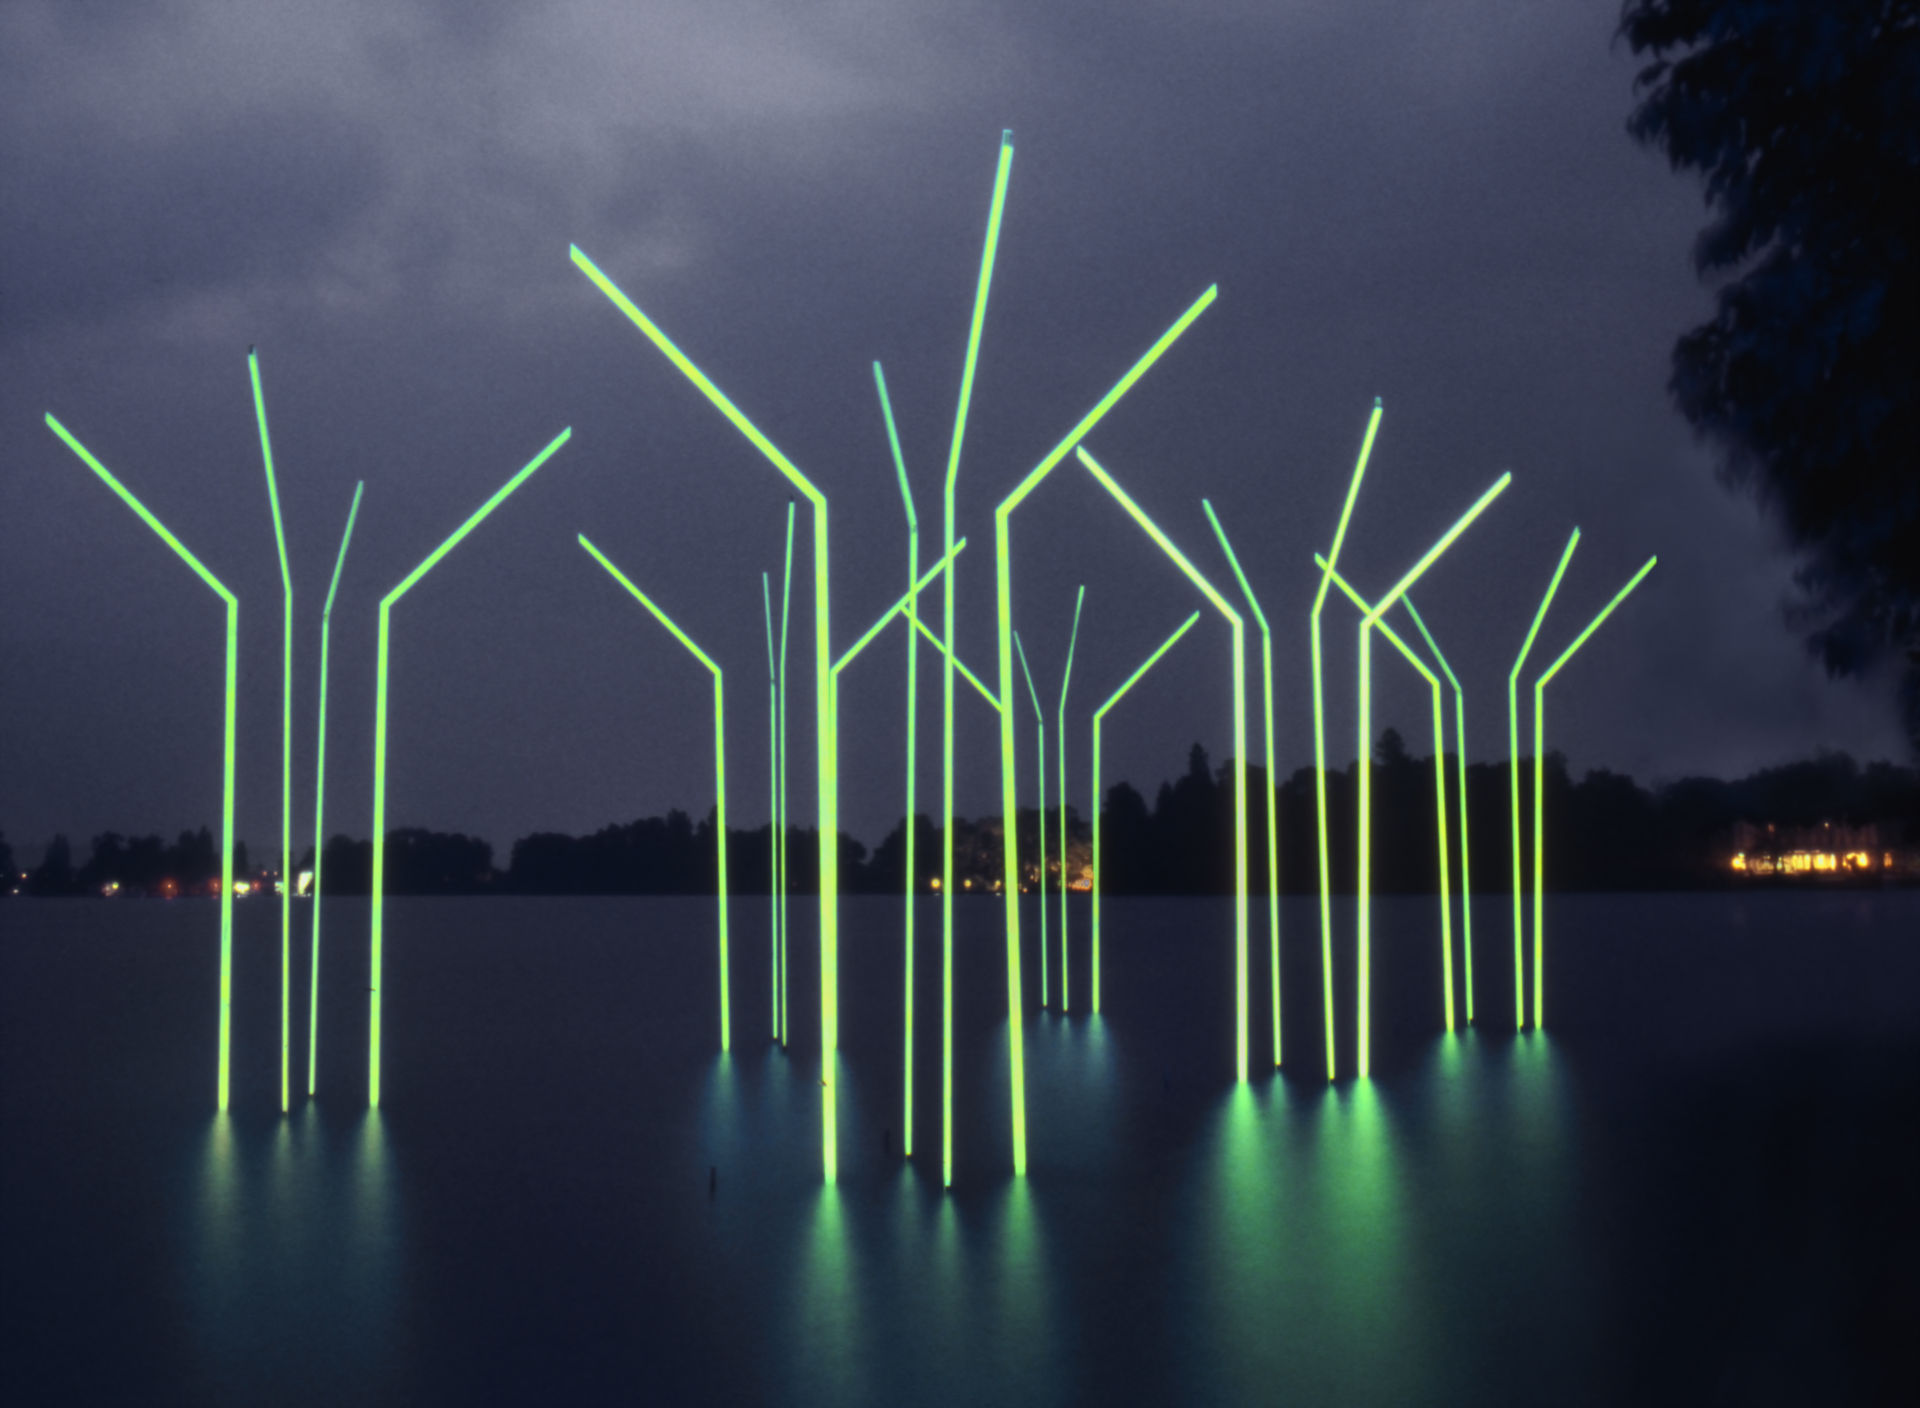 daniel_hausig_innenraum-außenraum 1988-89_light-art-installation